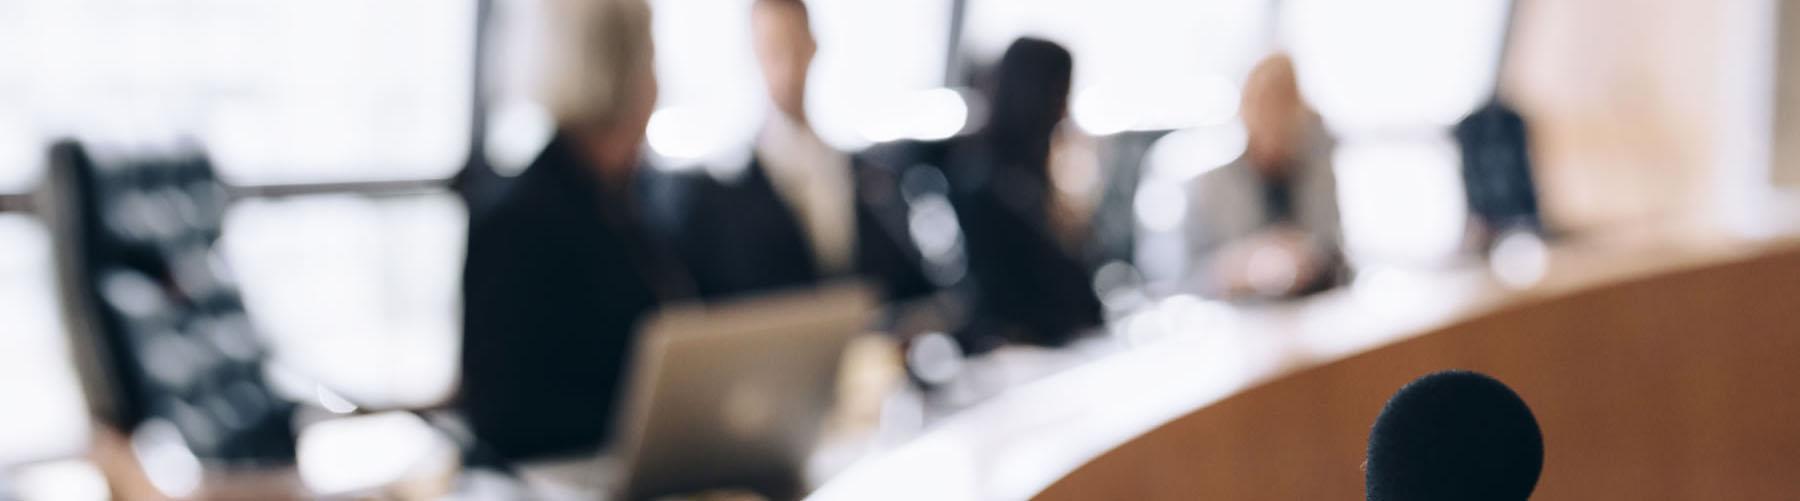 Meeting at boardroom